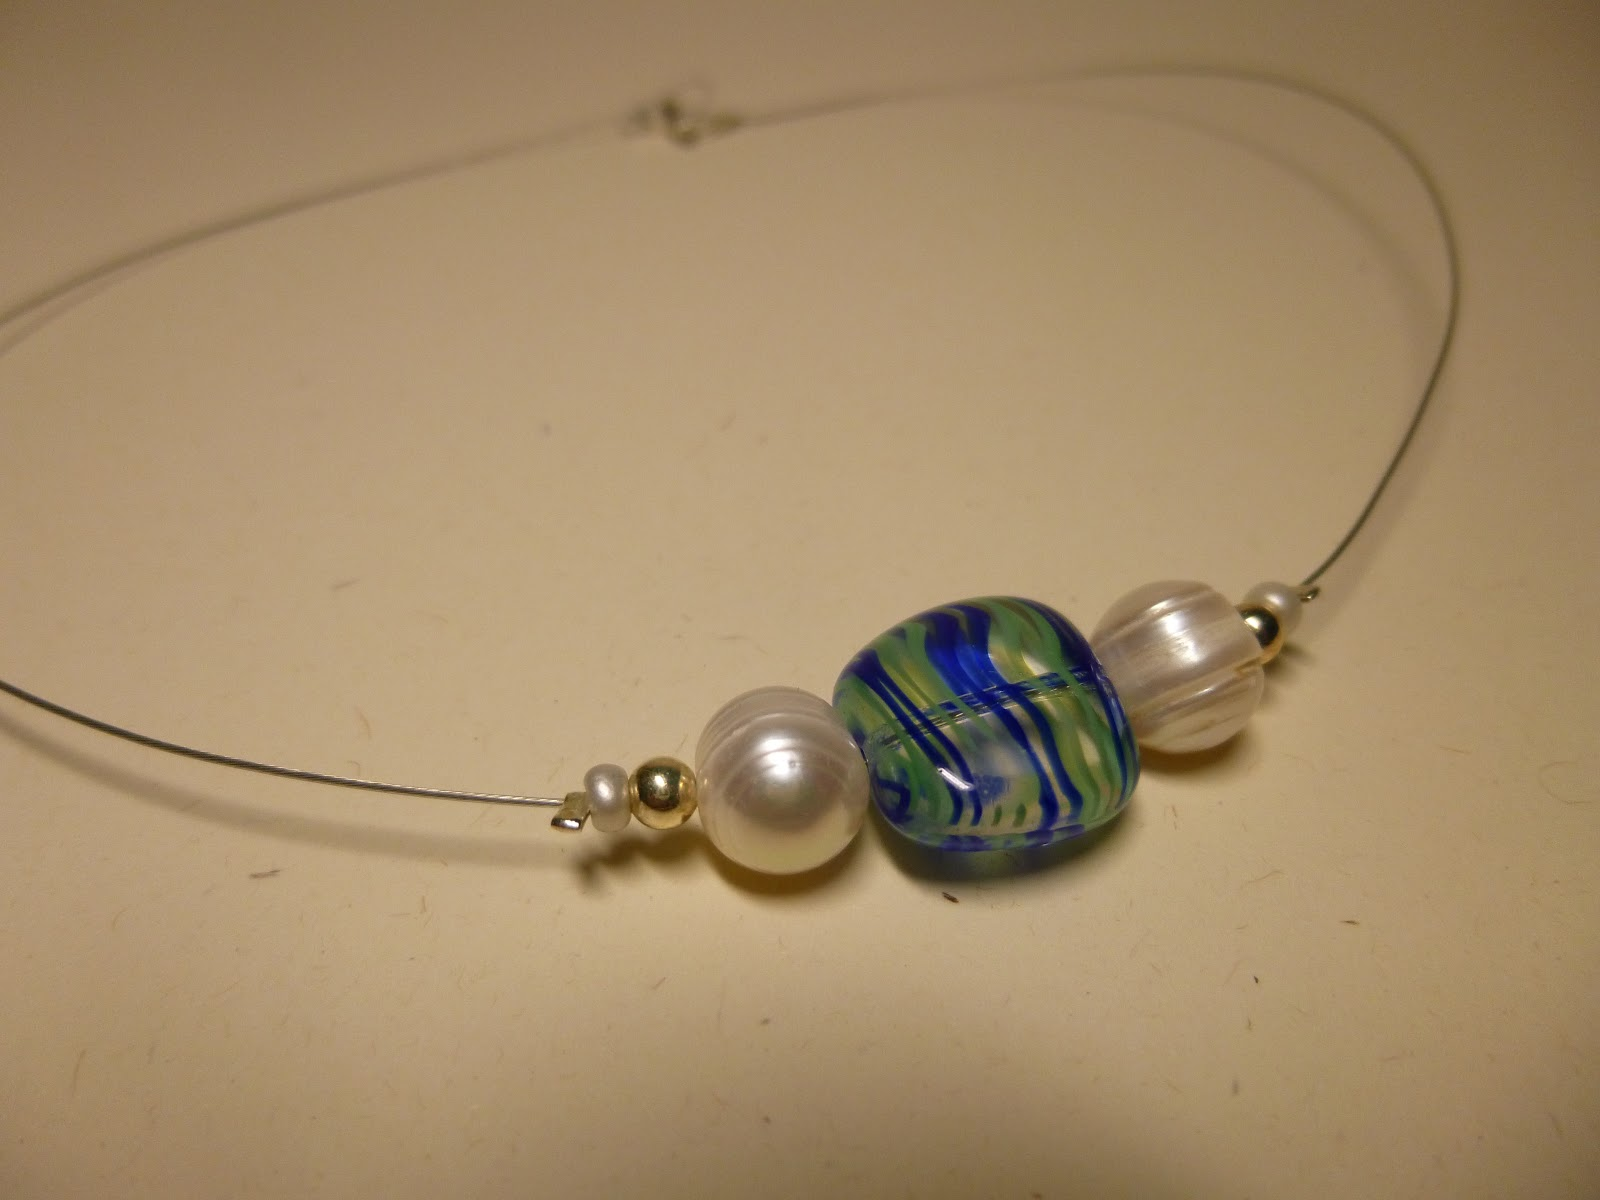 pulsera dorado plata perla  marusa  bonit original barata € regalo reyes madre novia